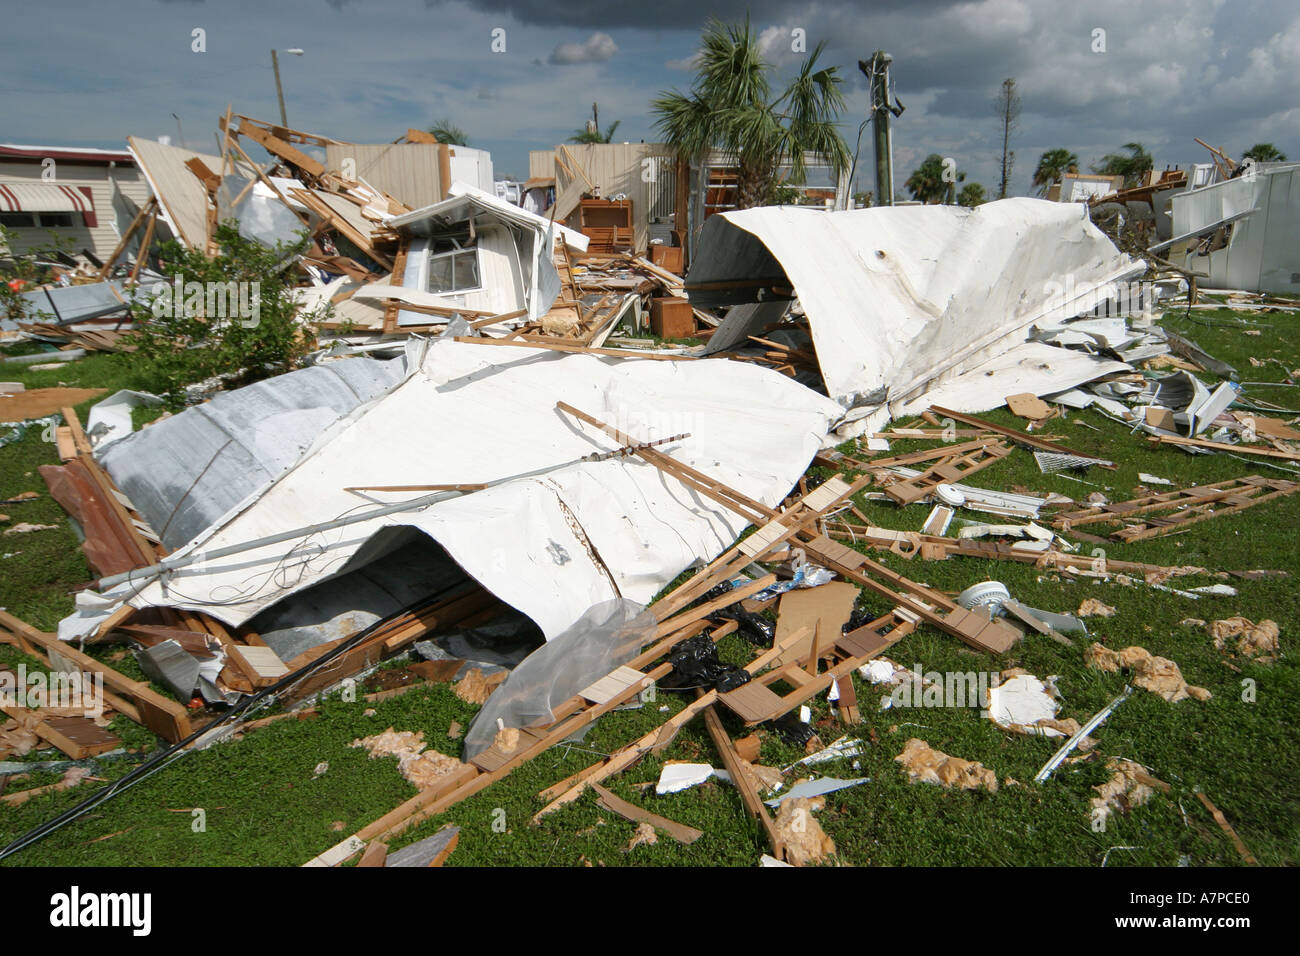 Florida Punta Gorda Mobile Home Modular Trailer Park Hurricane Charley Damage Destruction